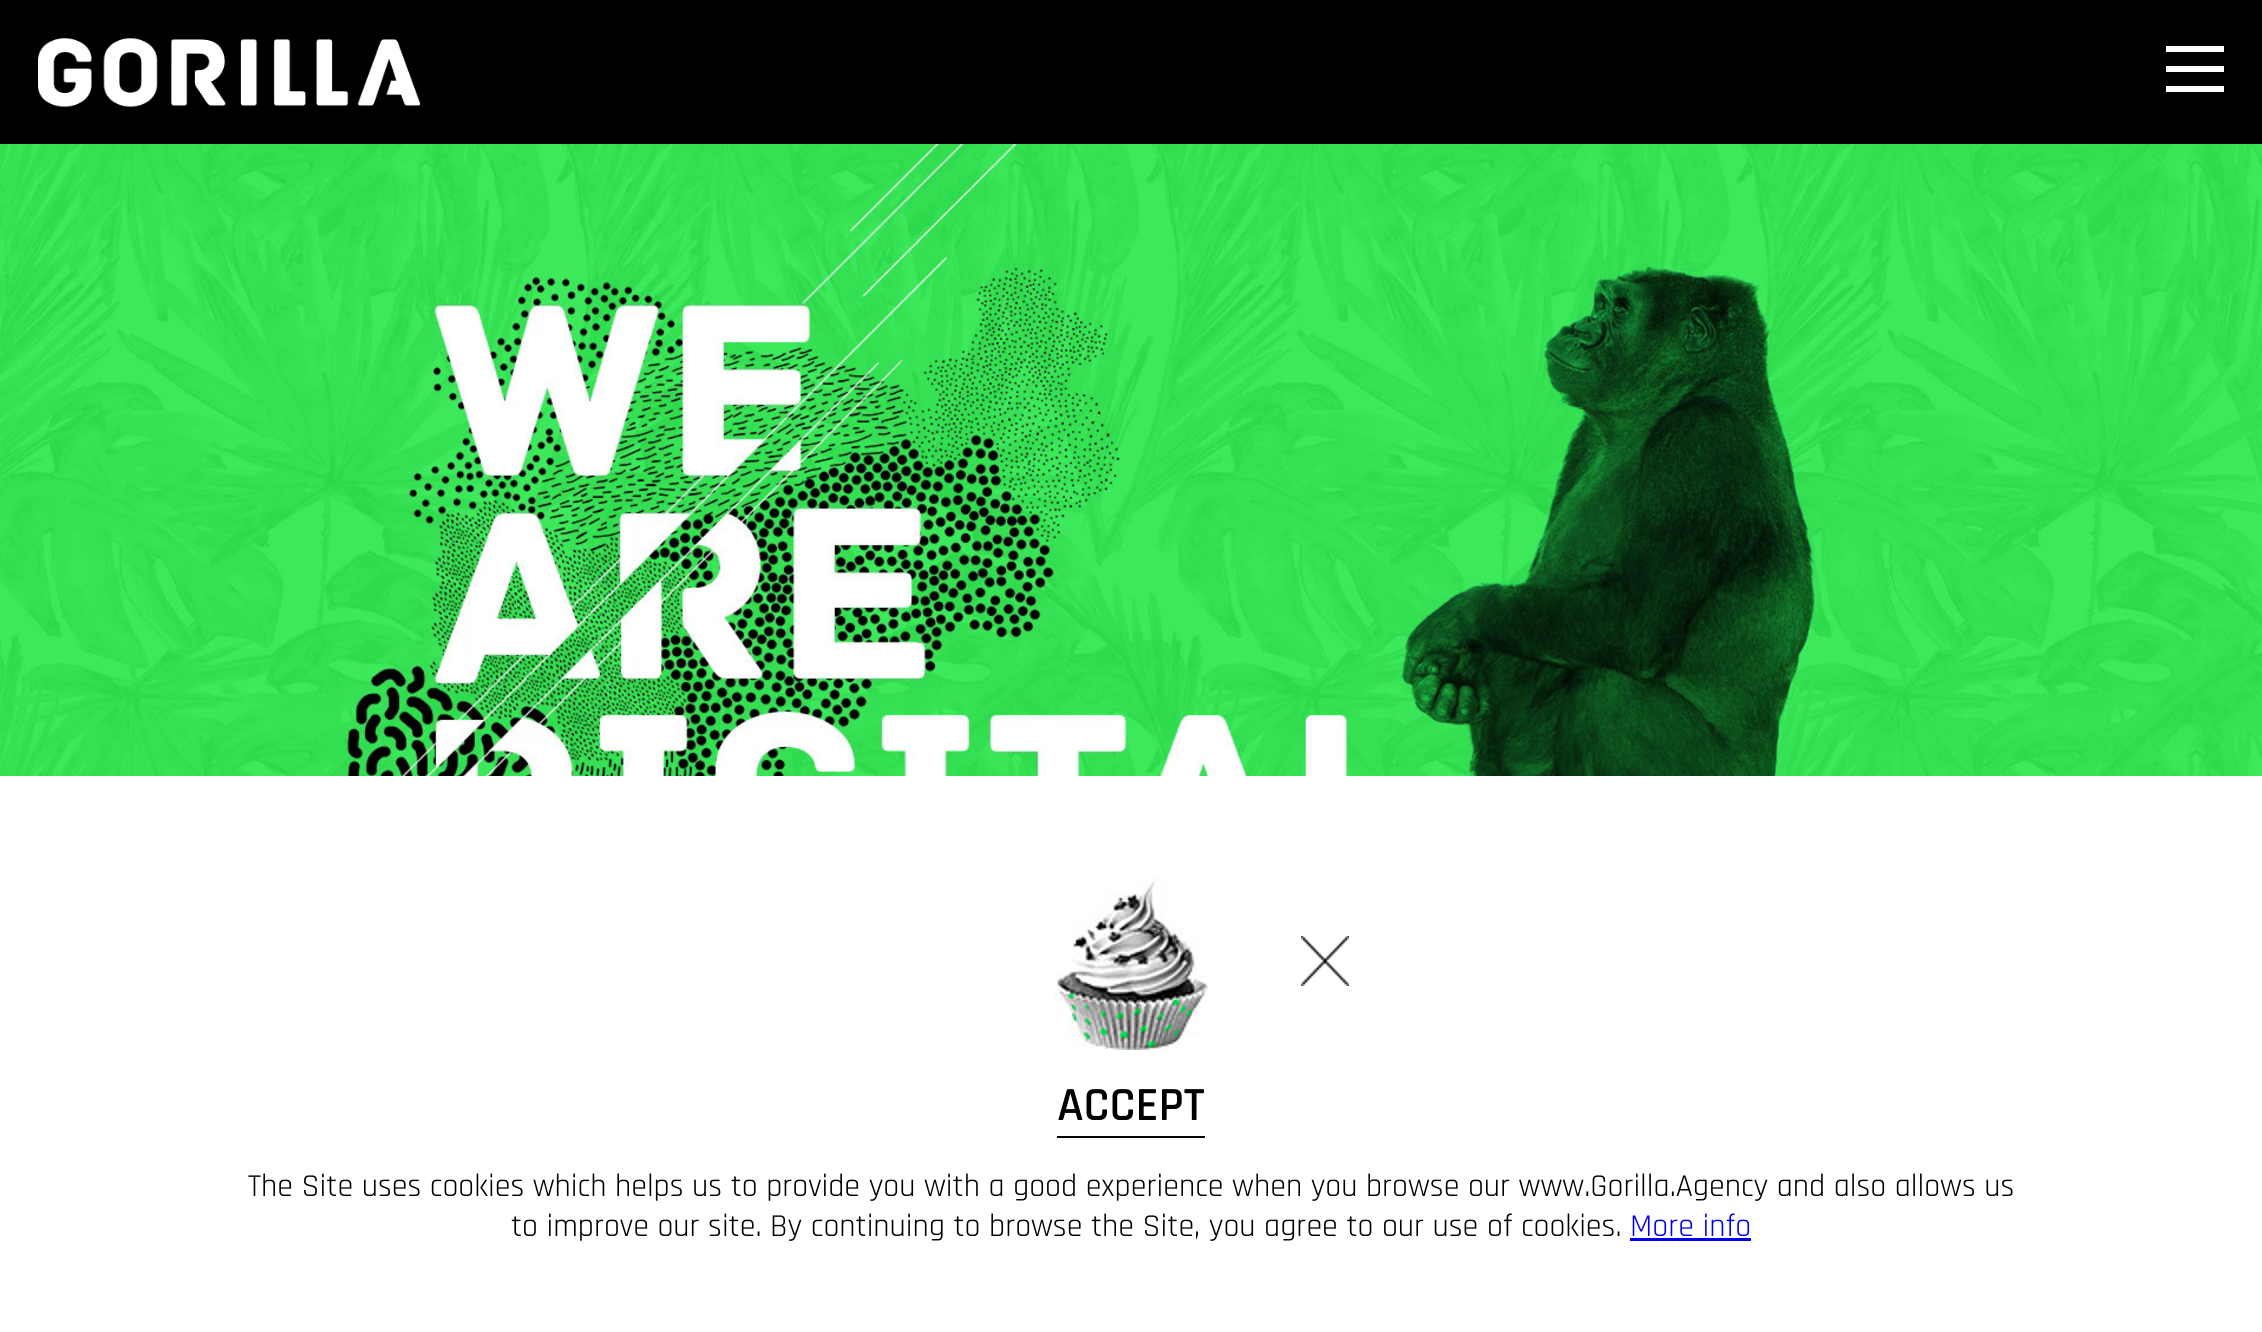 gorilla.agency